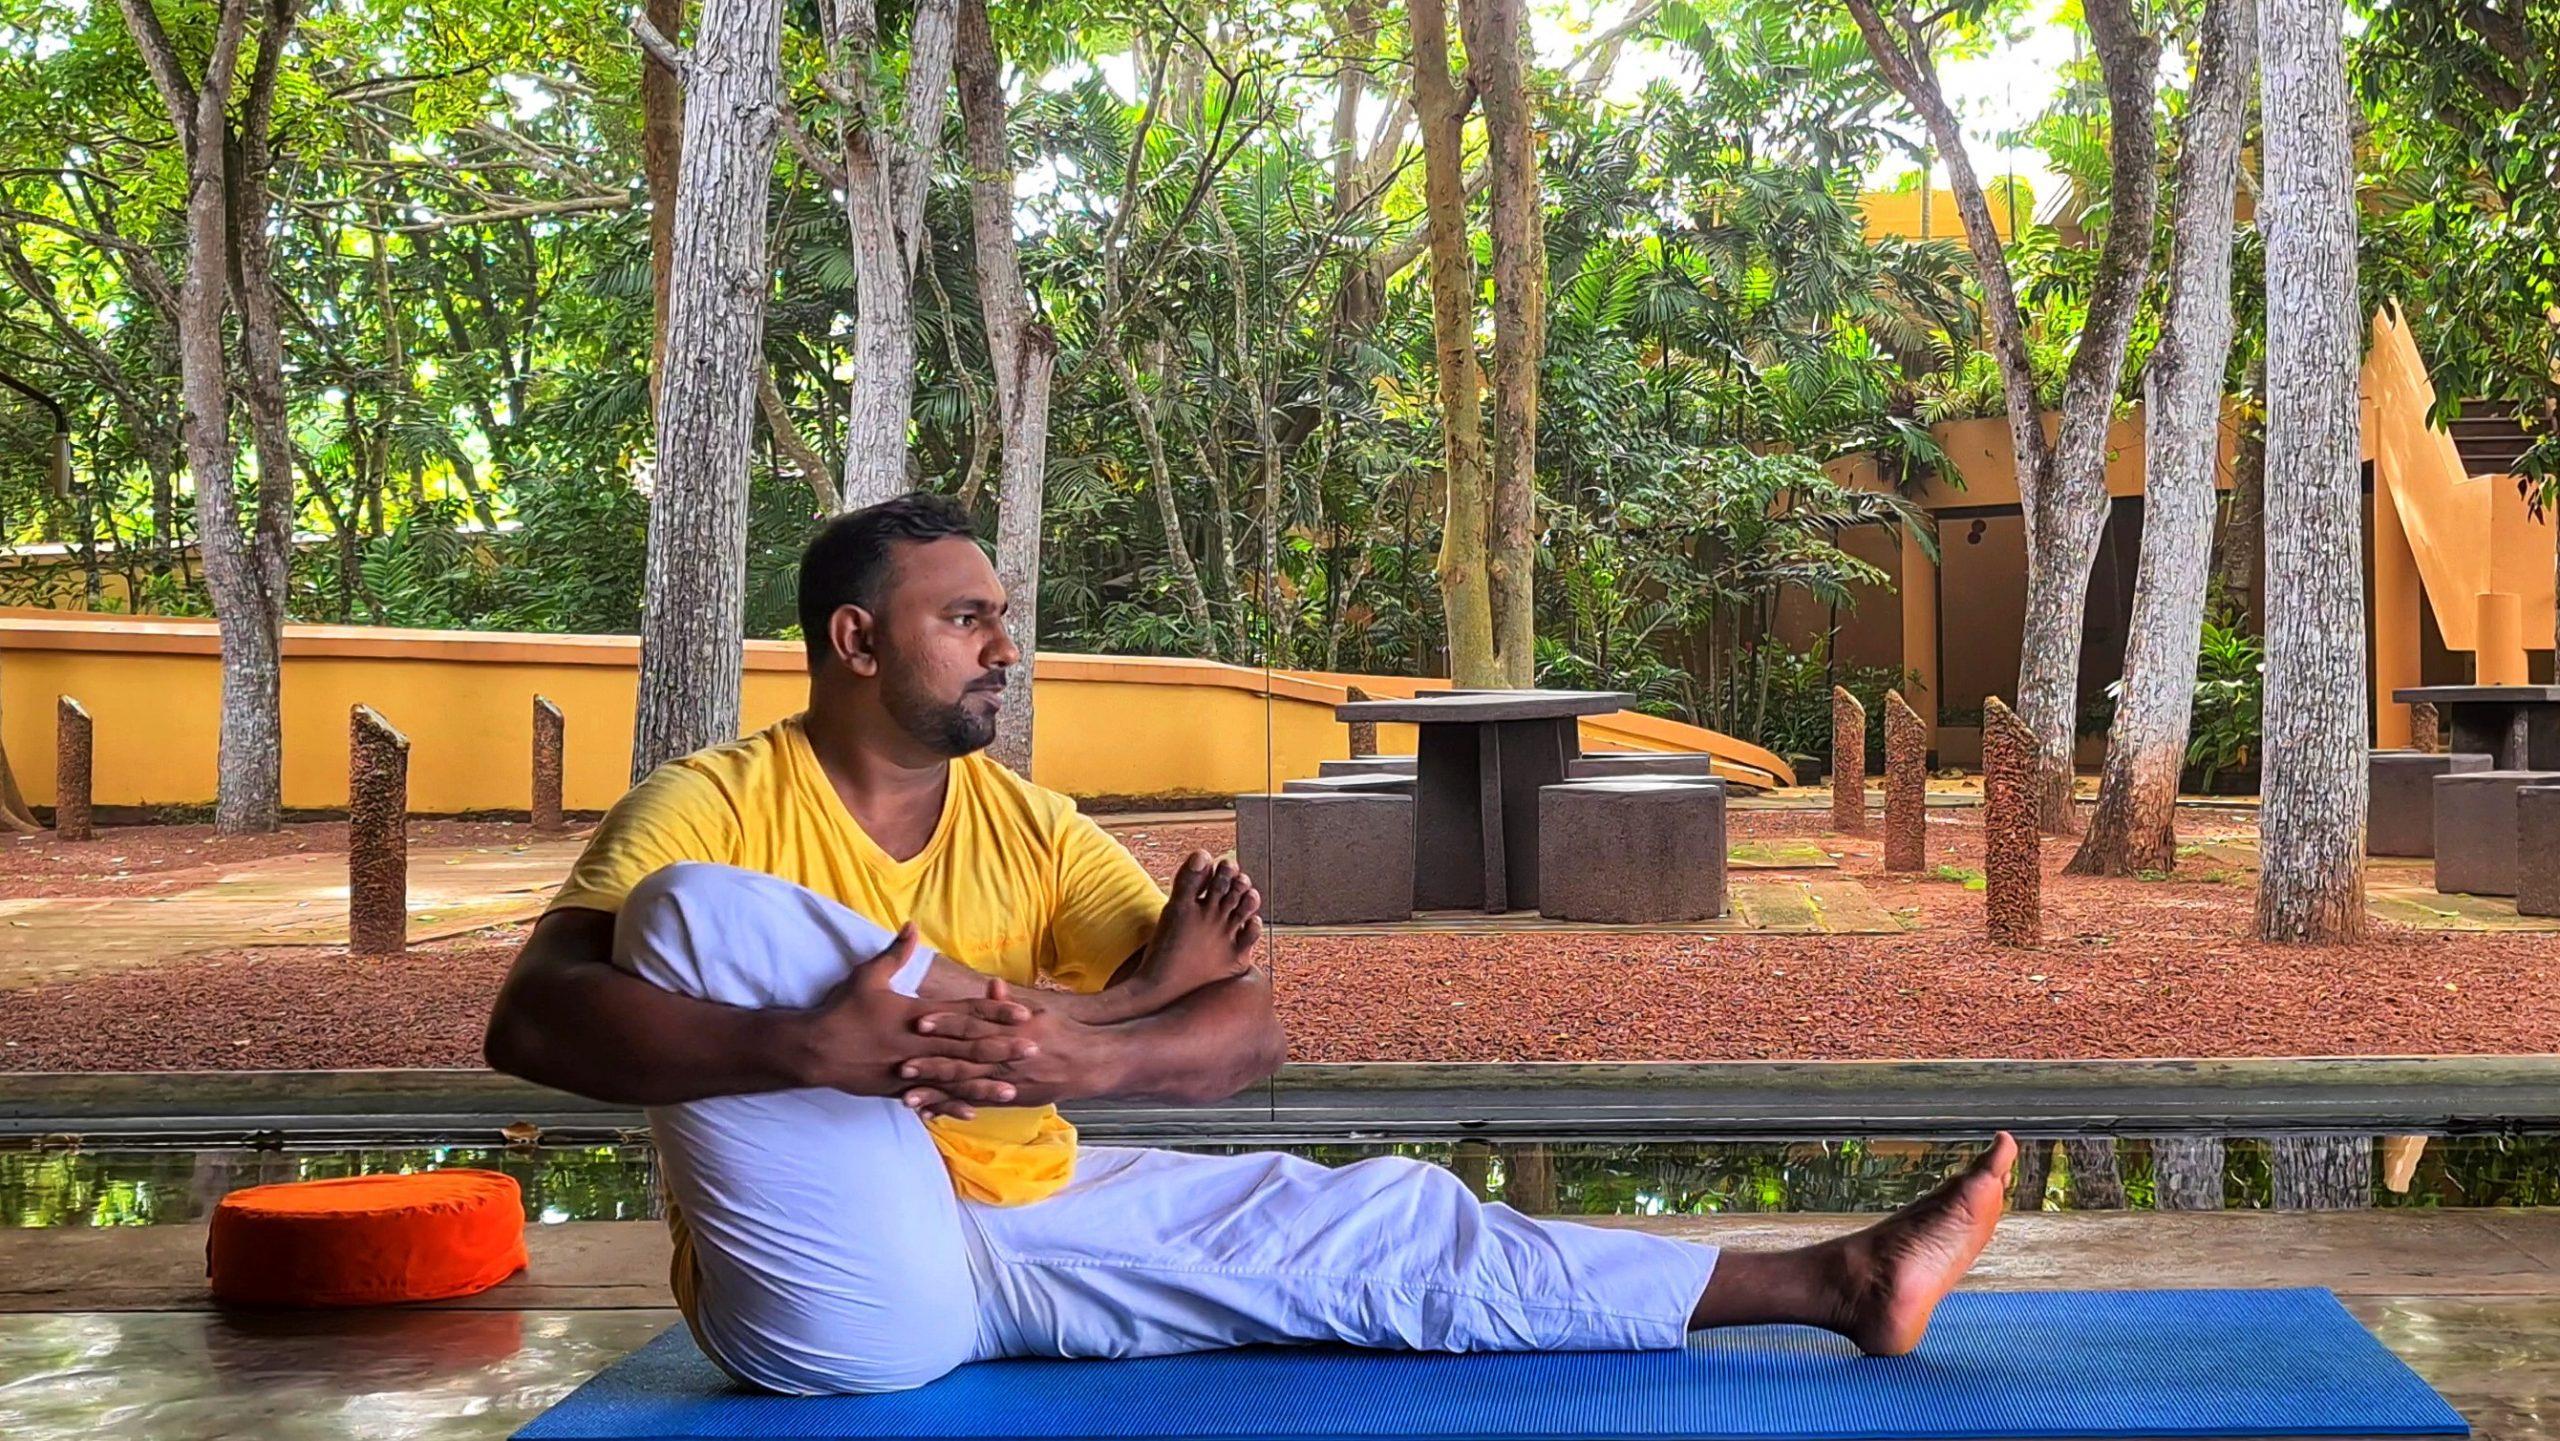 Yoga Instructor at Barberyn Demonstrating Yoga Asana